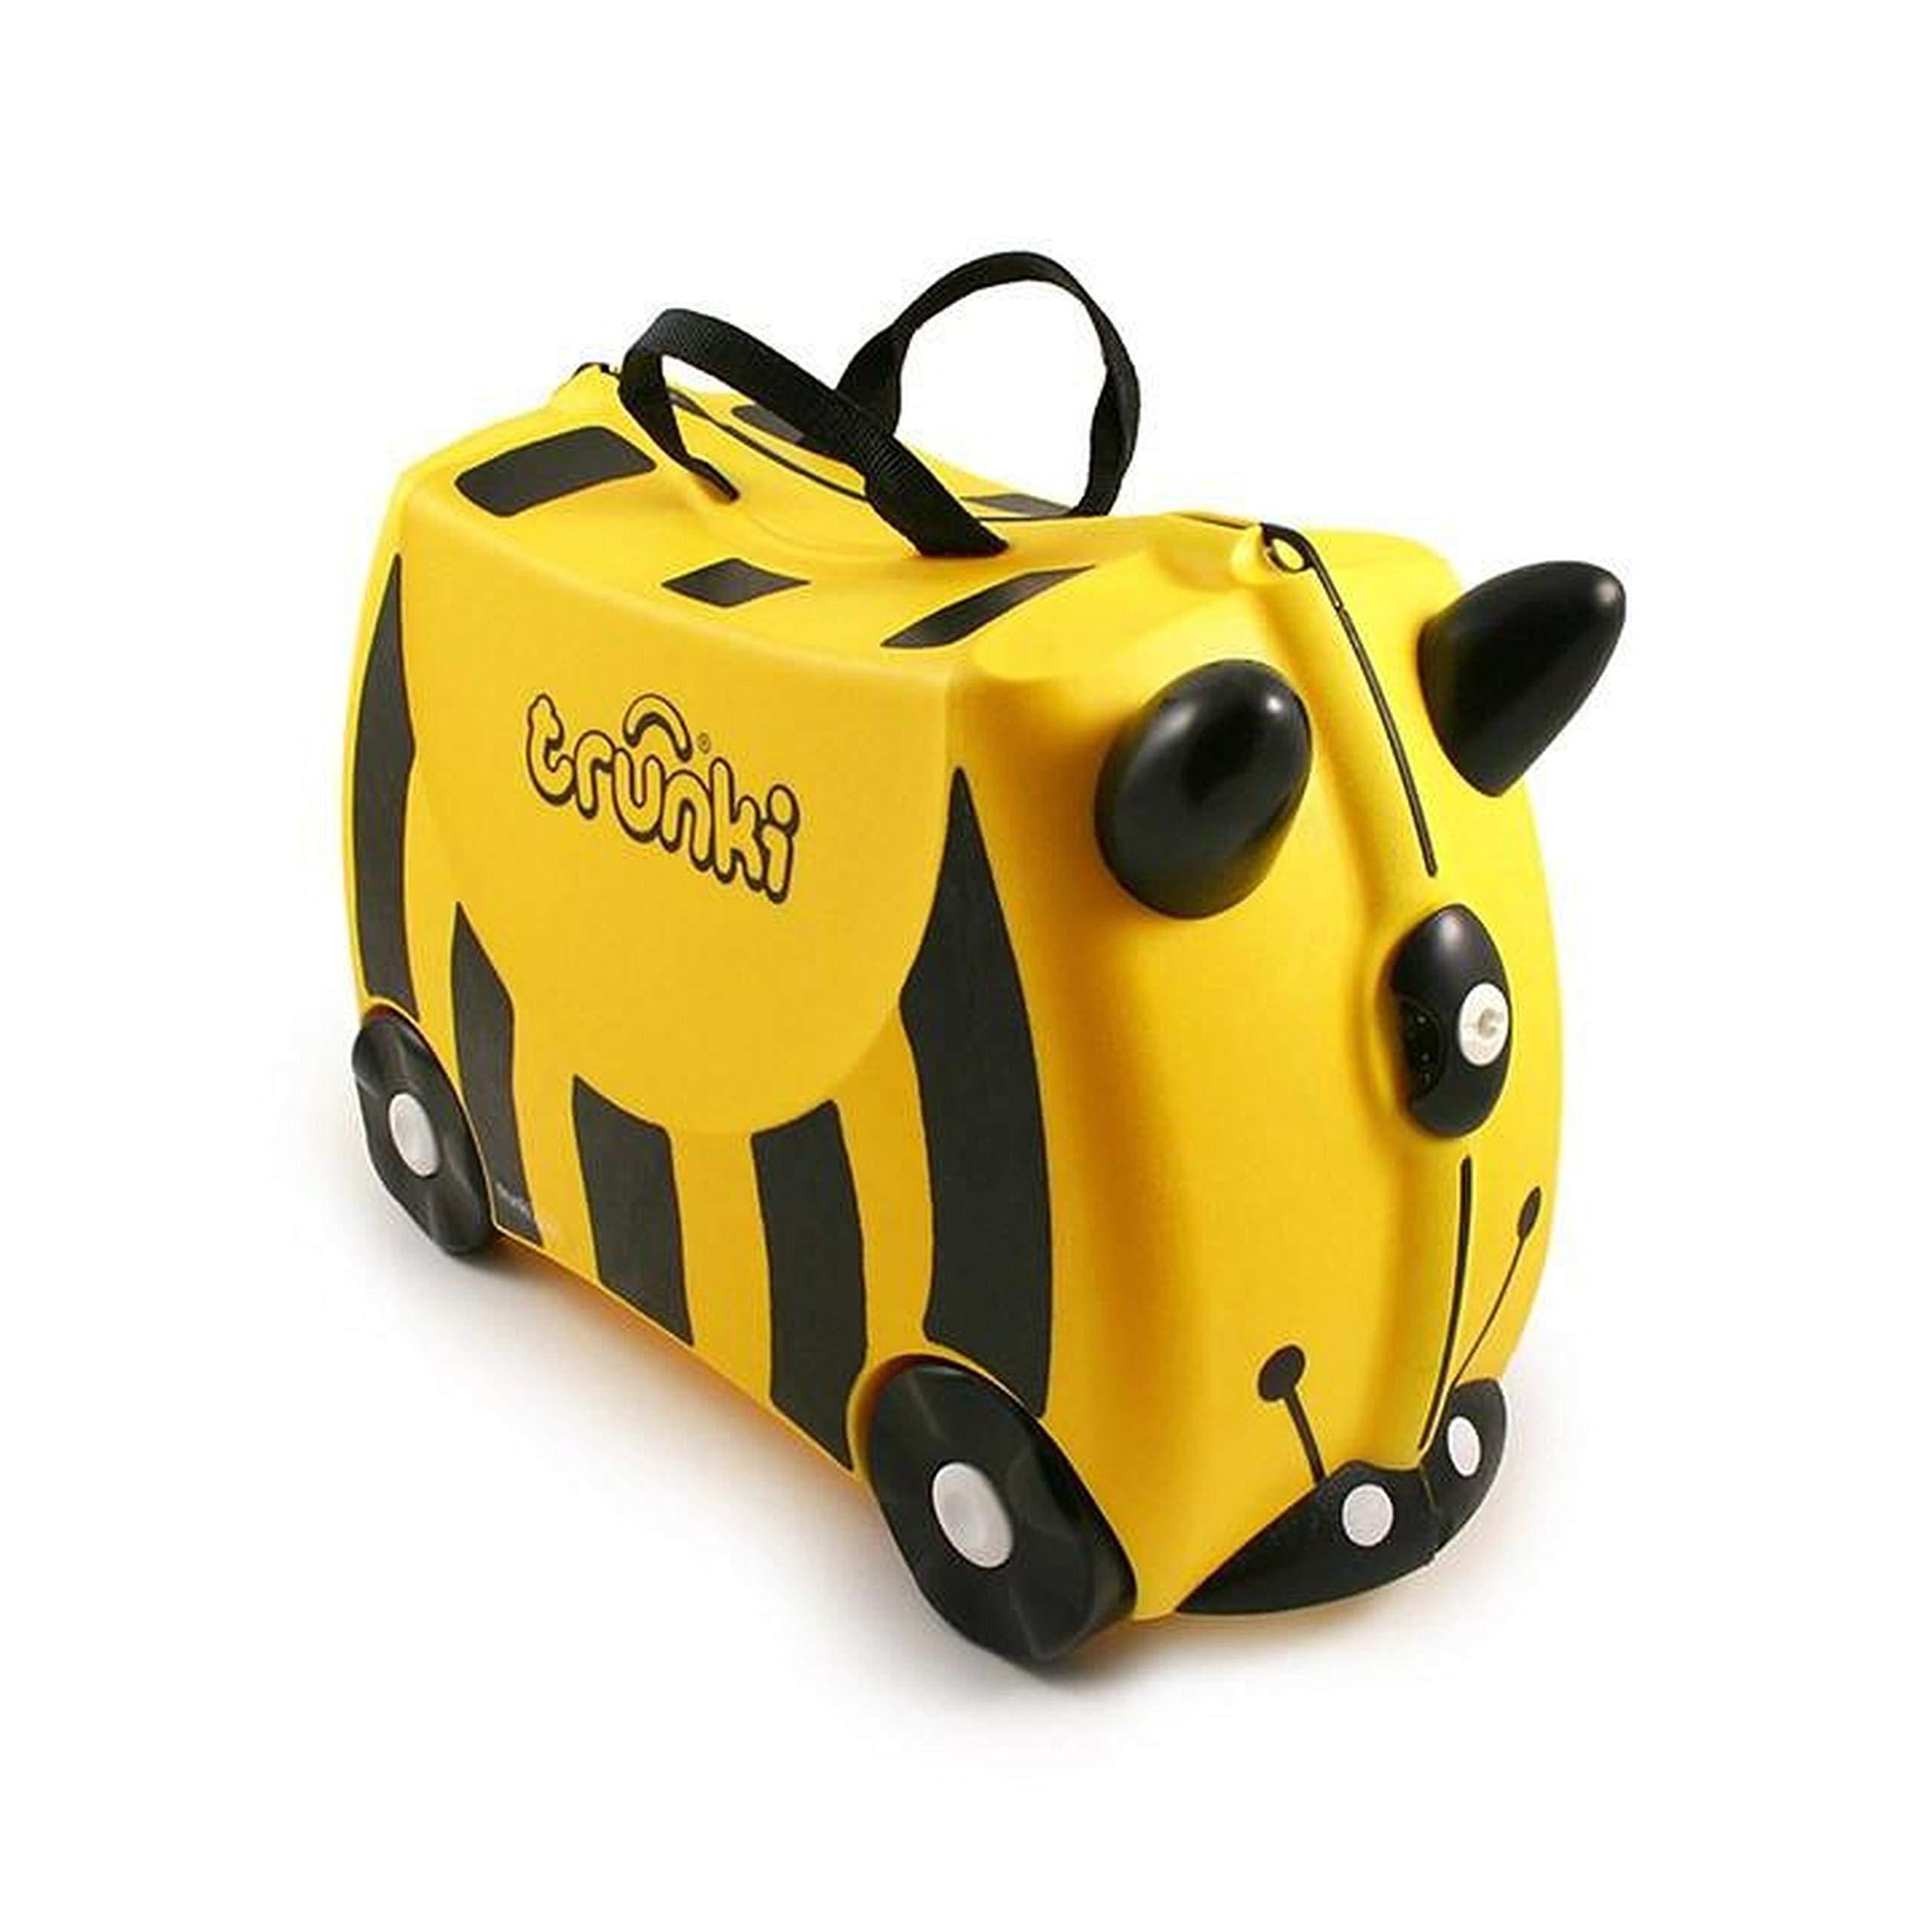 bab8912498 Amazon.com  Trunki Original Kids Ride-On Suitcase and Carry-On Luggage -  Bernard (Yellow)  Baby